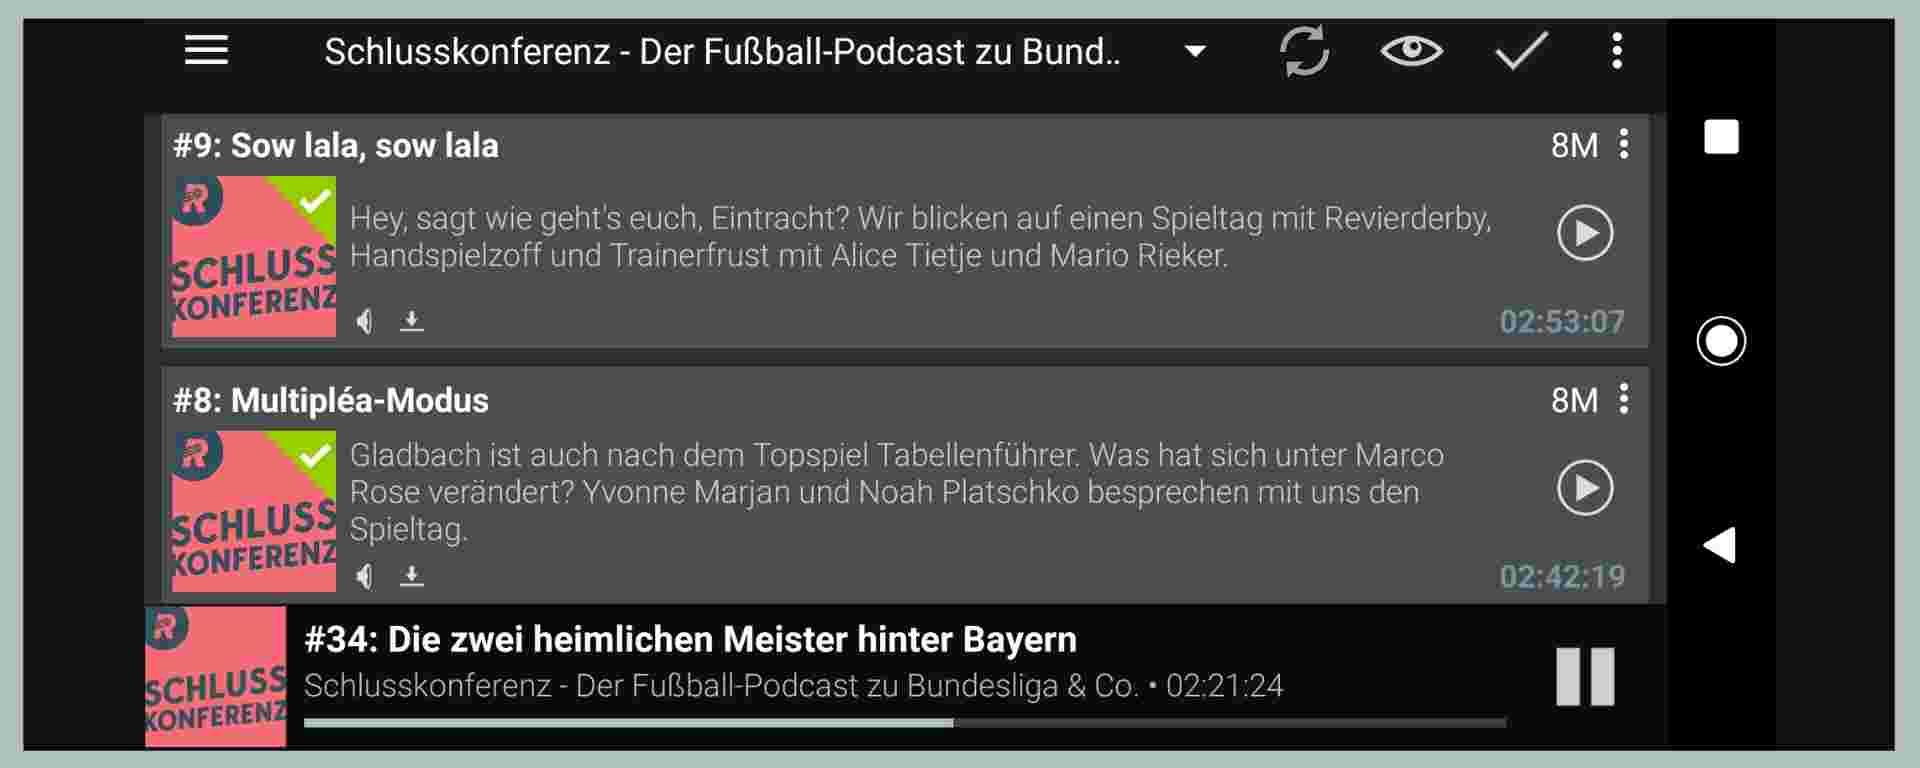 Rasenfunk-Podcast (Podcast-App-Ansicht)